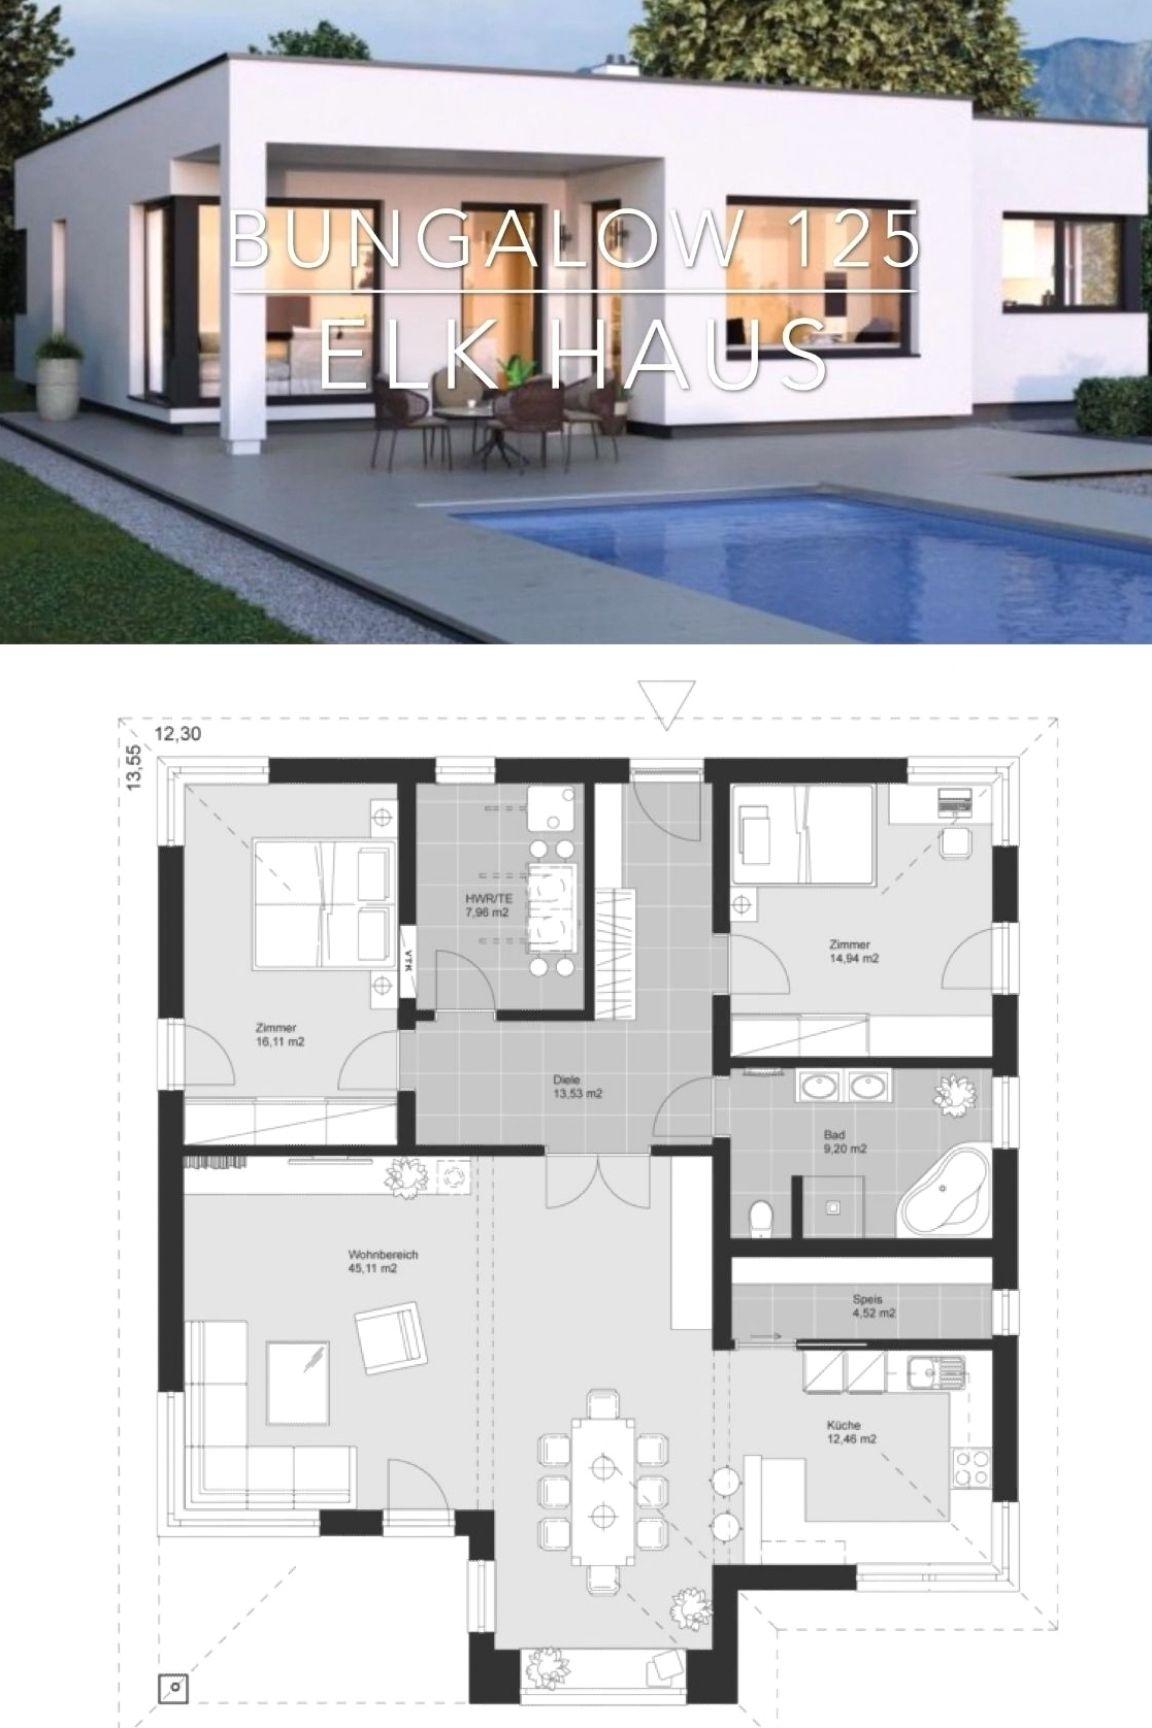 Room Tumblr Videos Minimalist Bedroom Roomdecor Interiordesign Bungalow House Plans Dream House Exterior Modern Architecture Design